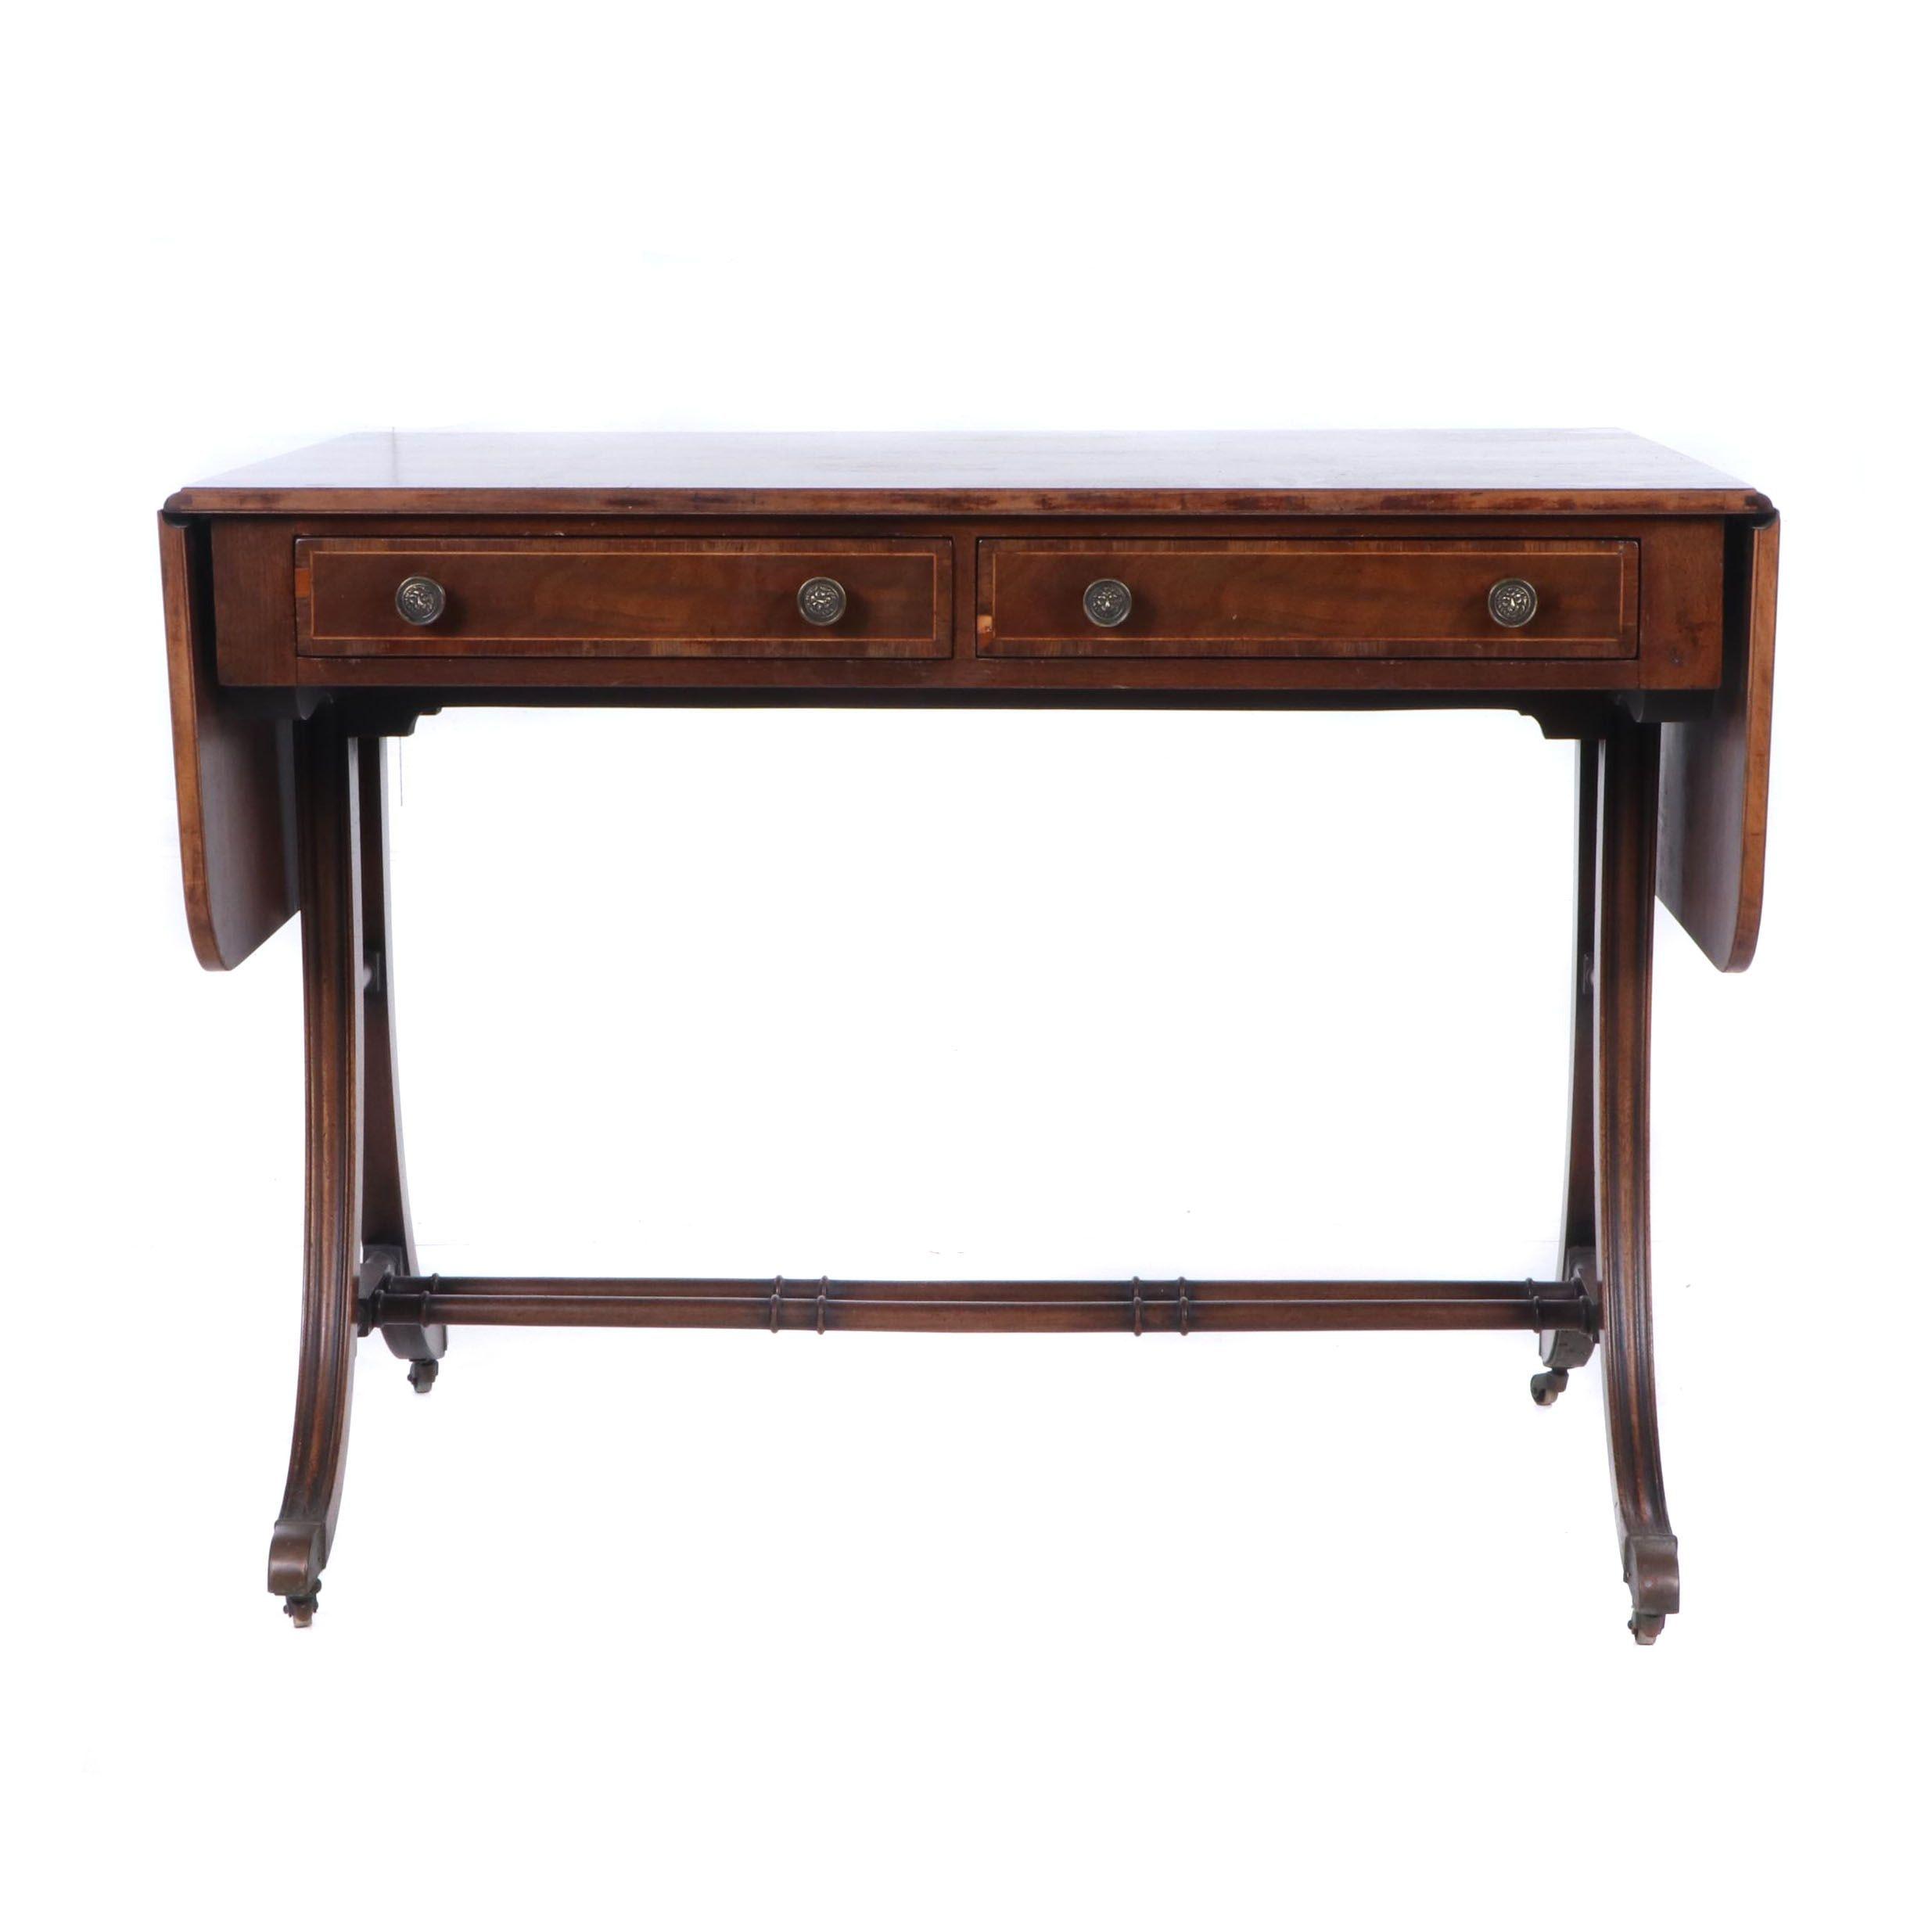 Regency Mahogany Drop Leaf Writing Table, Early 19th Century